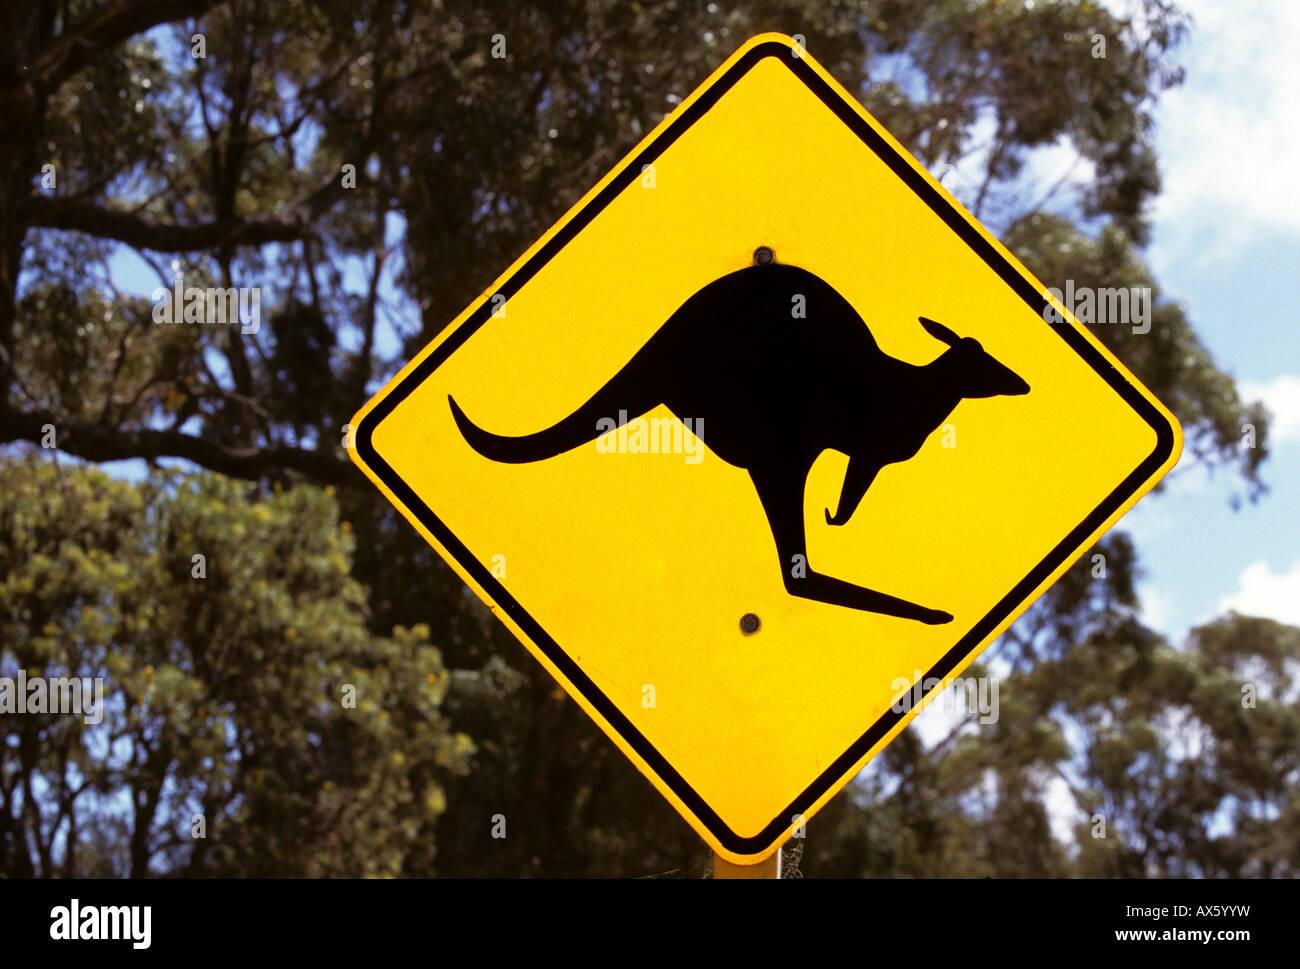 Kangaroo crossing sign, Queensland, Australia - Stock Image